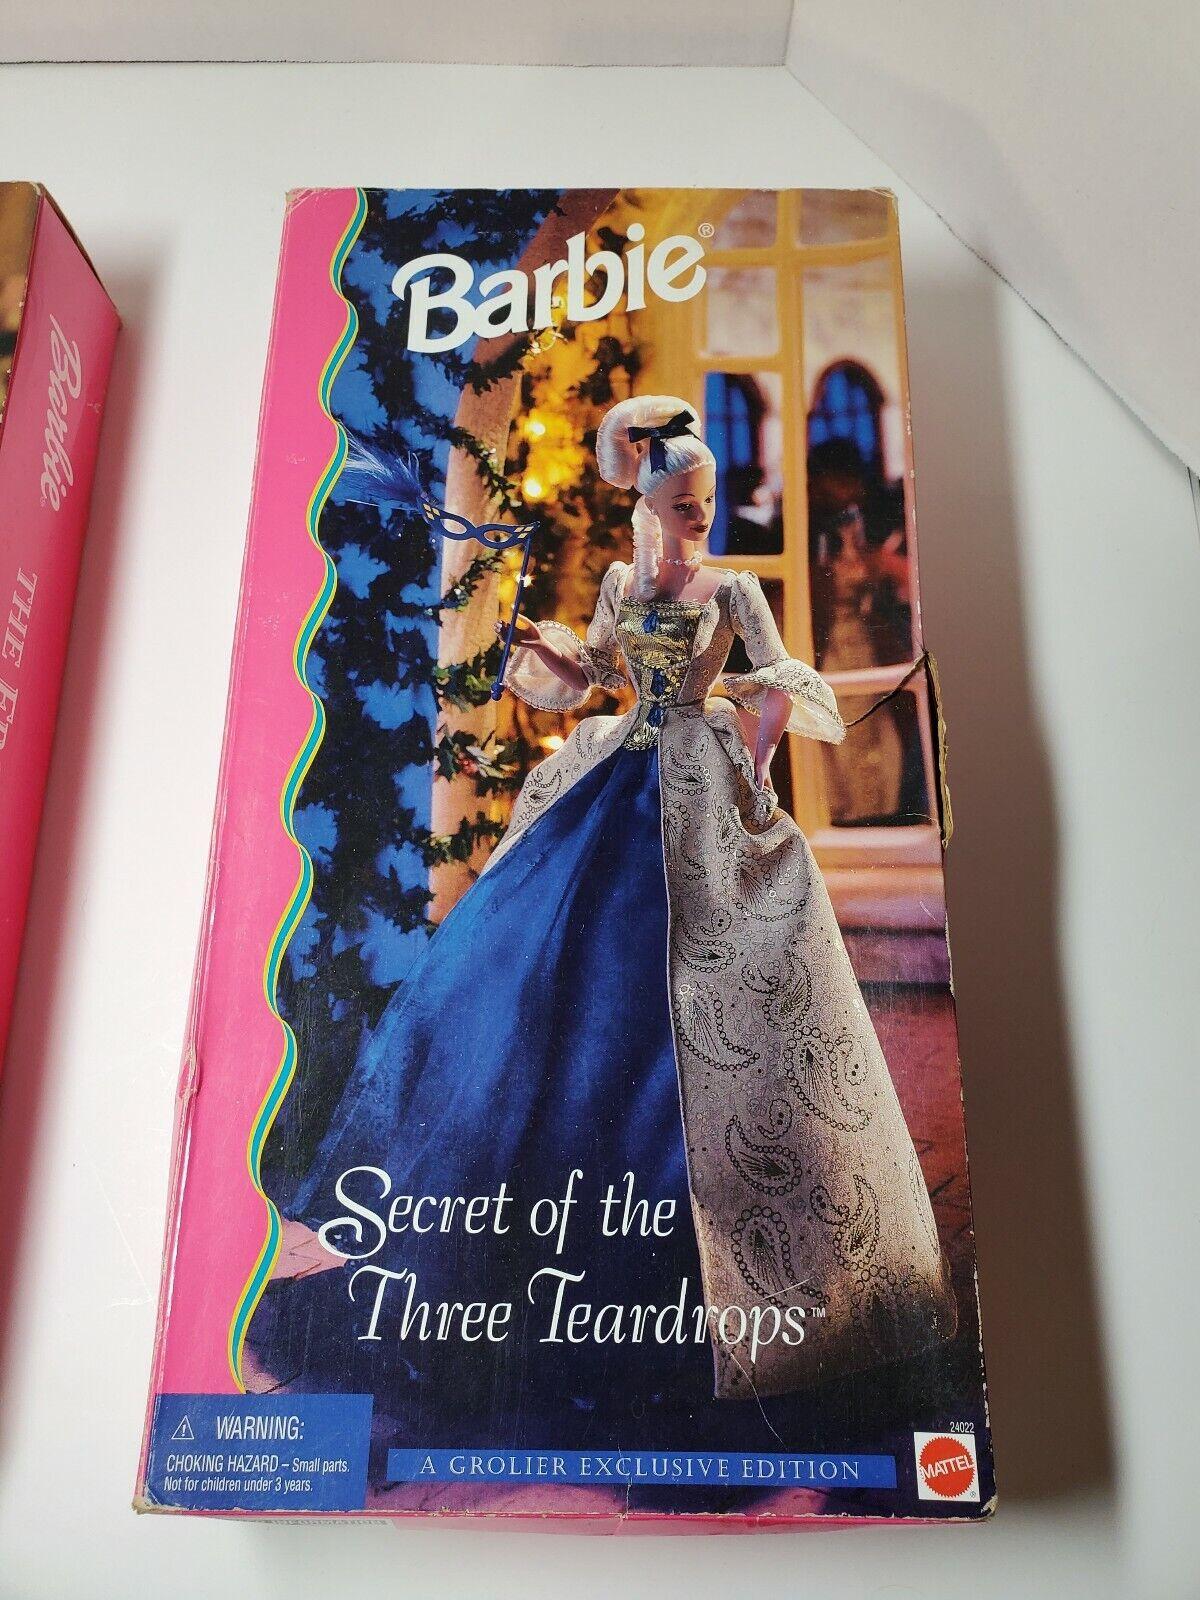 BARBIE THE SECRET OF THE THREE TEARDROPS